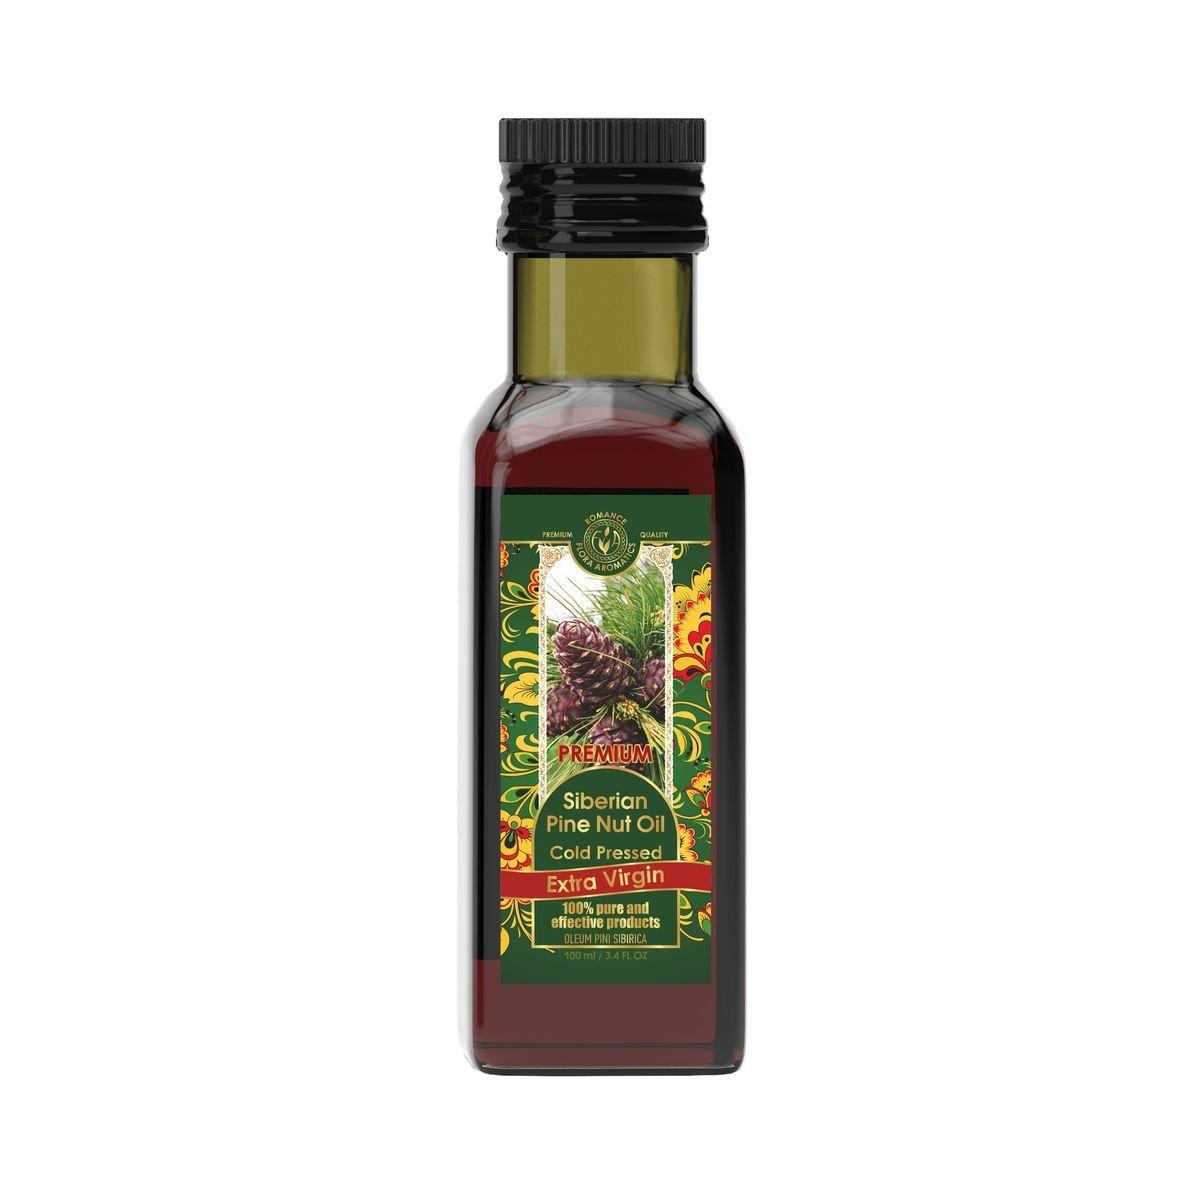 Siberian Pine Nut Oil Cold Pressed Extra Virgin 3.4 fl oz/100 ml by Flora Aromatics